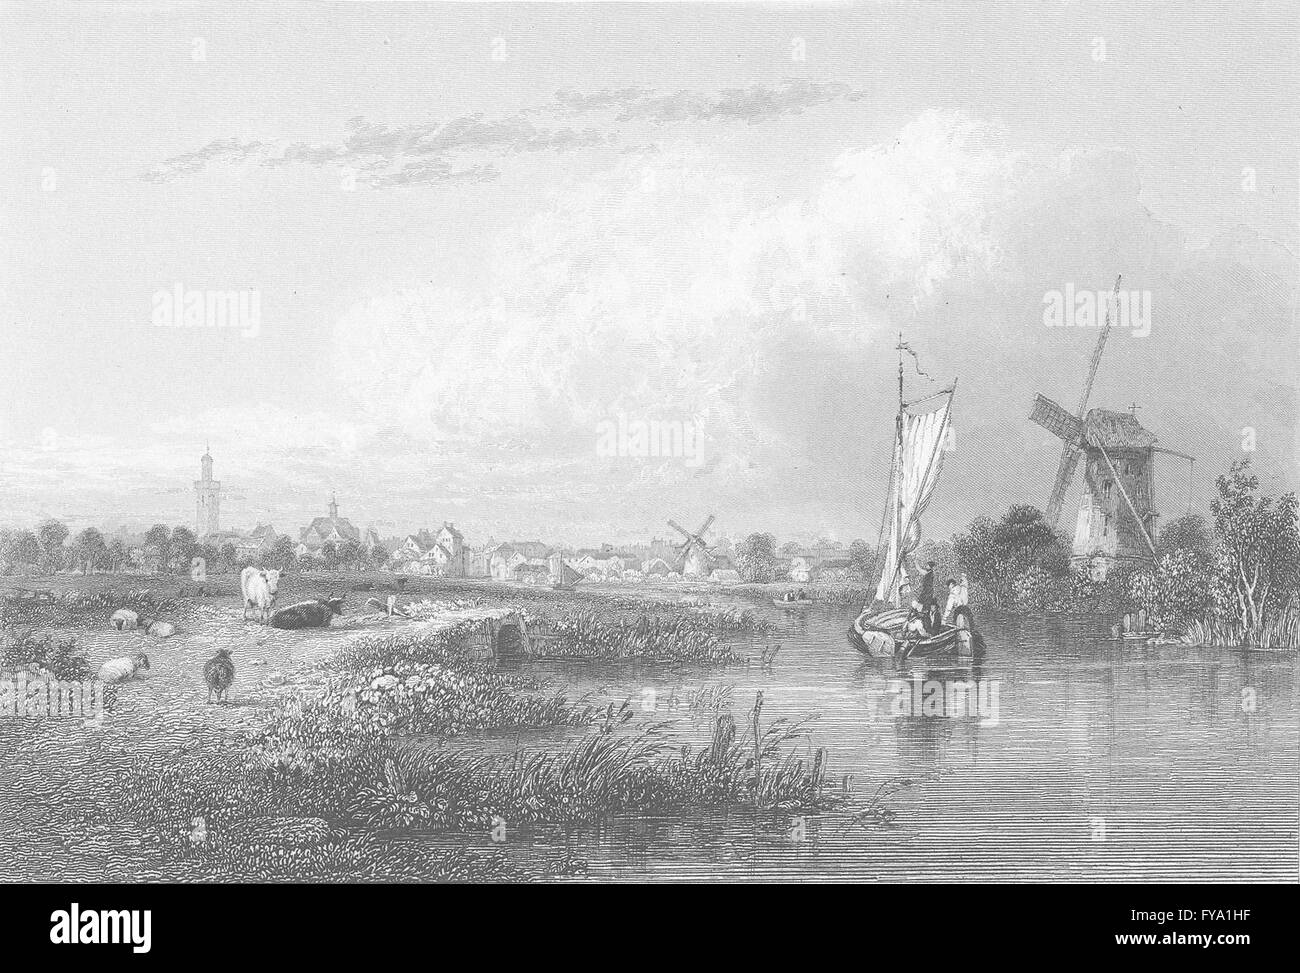 NETHERLANDS: The Hague ; Finden, antique print 1834 - Stock Image